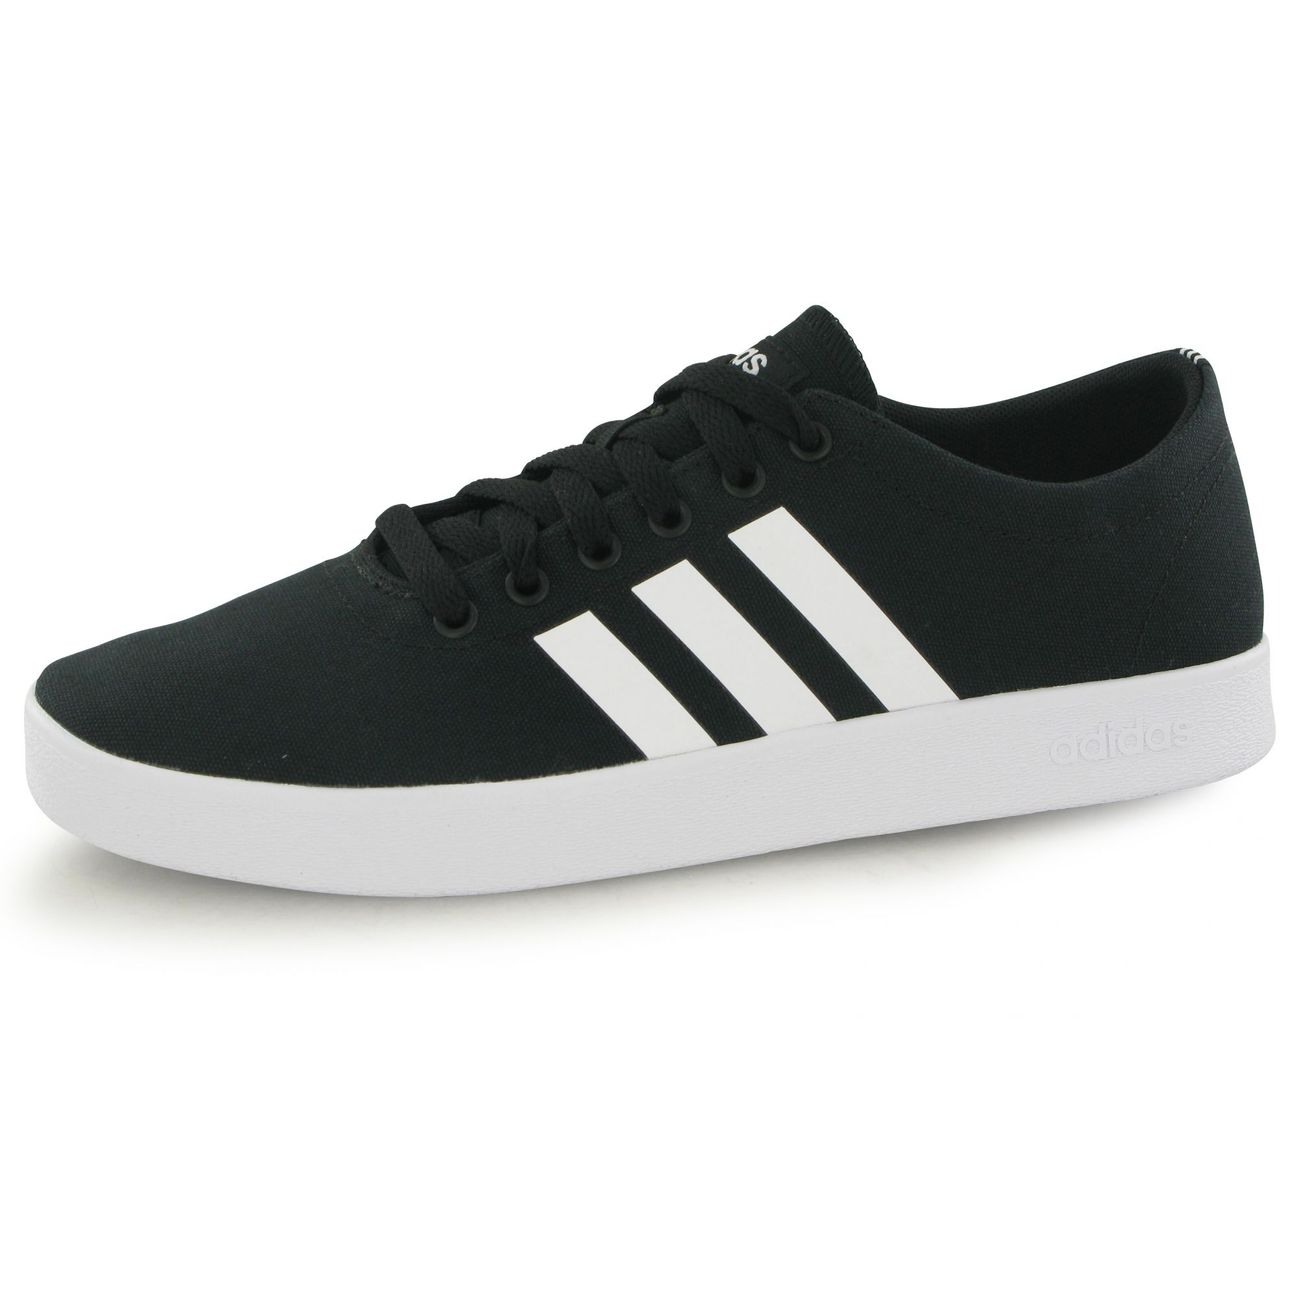 Adidas Neo Easy Vulc VS Baskets Hommes Chaussures Noir 9